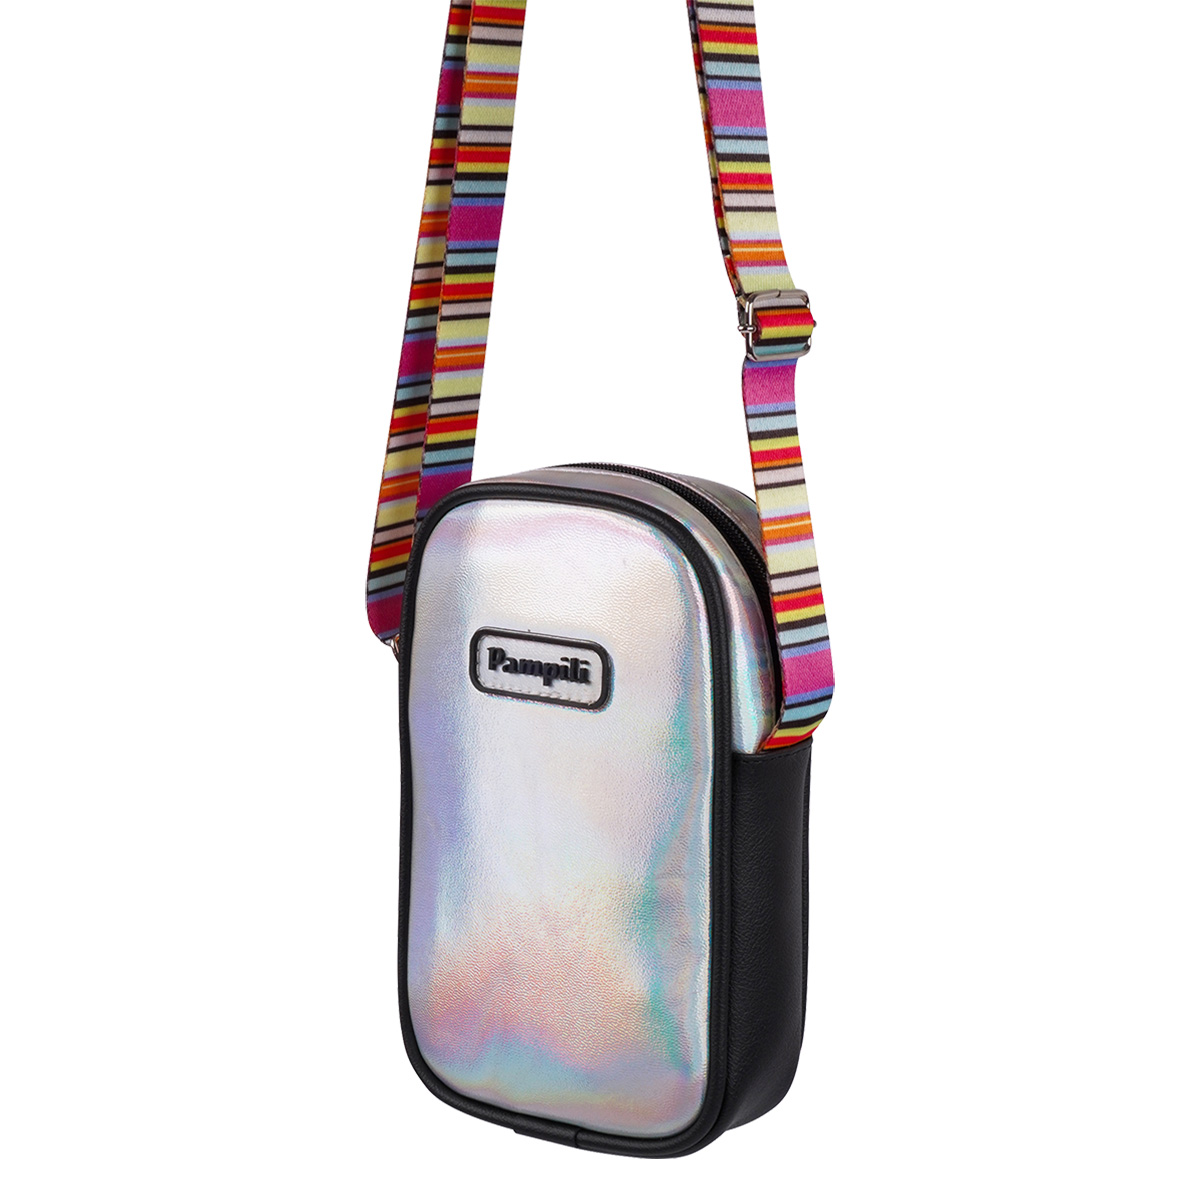 Bolsa Pampili Infantil Feminina Mini Bag Listras Coloridas